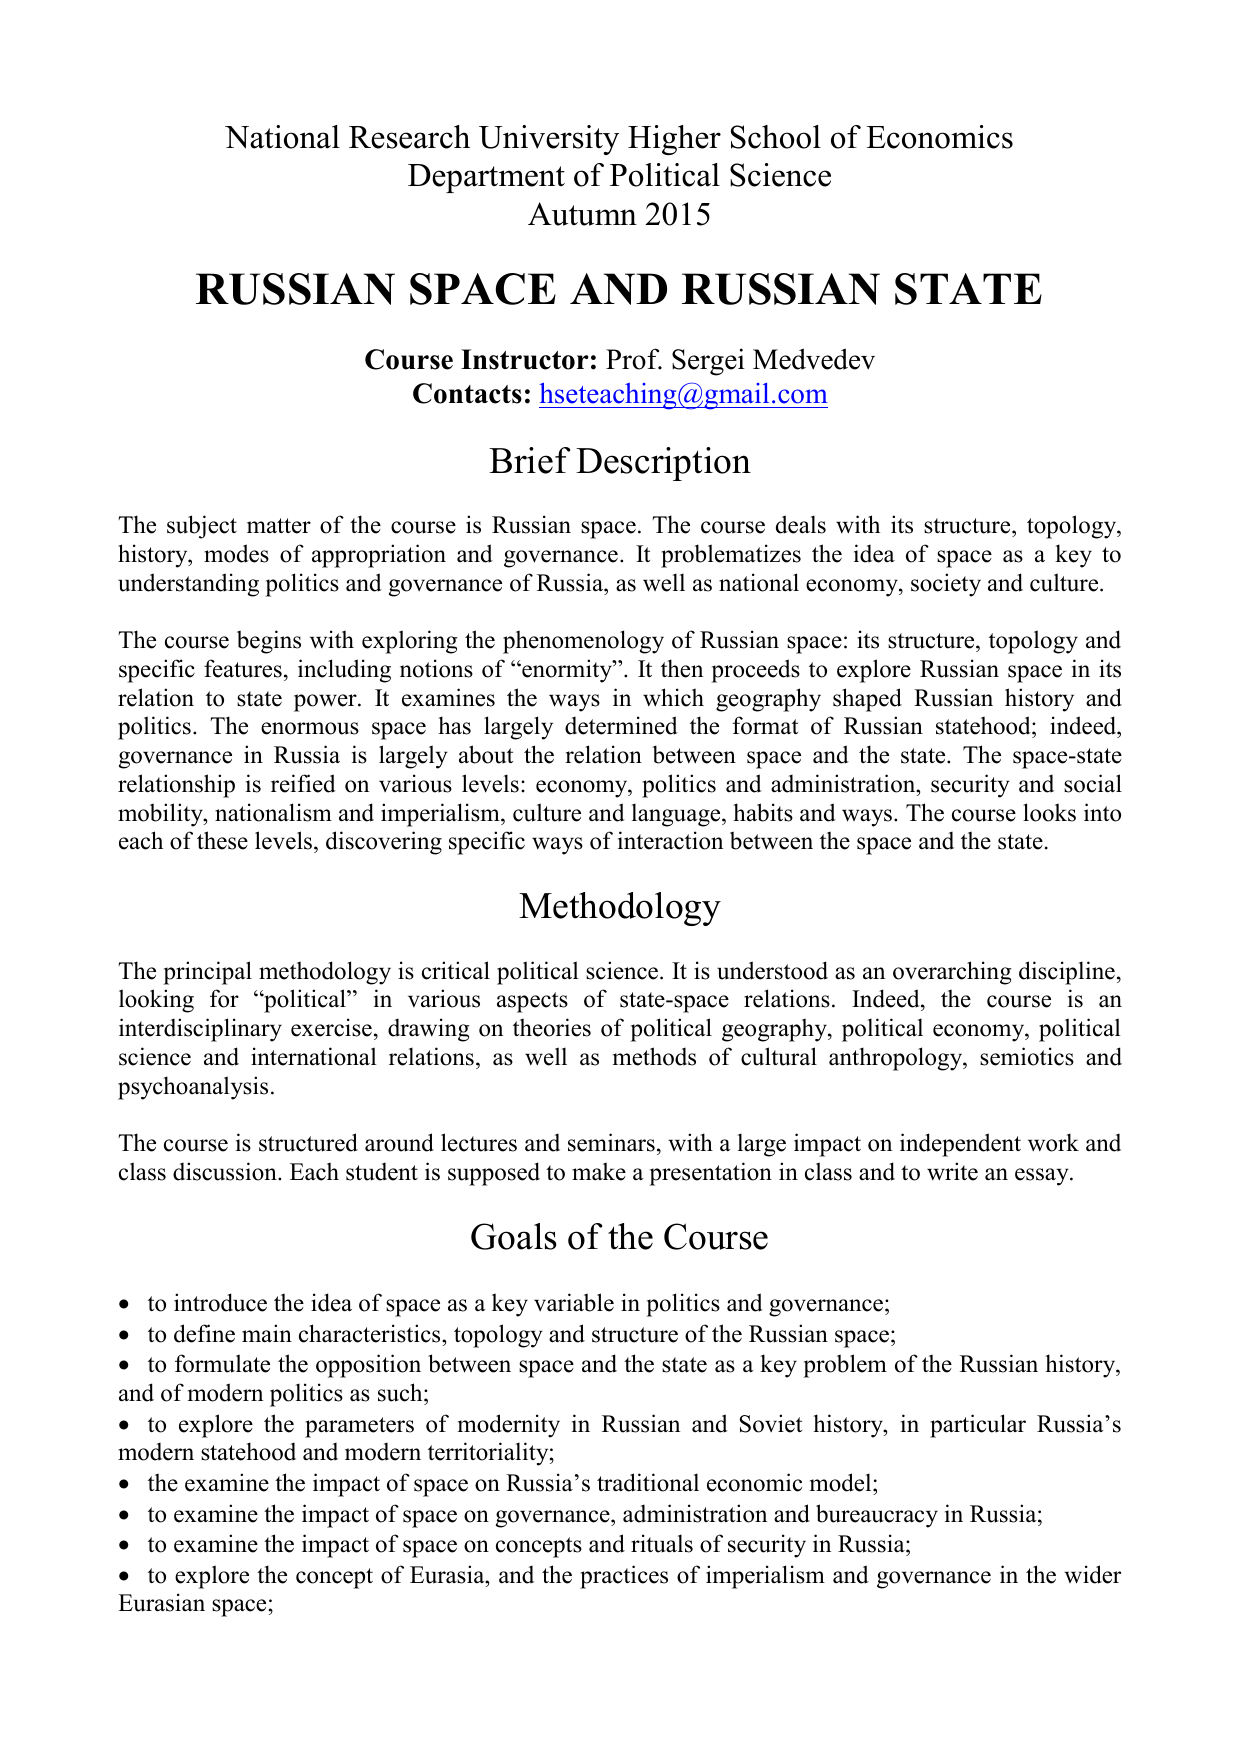 Medvedev RSRS Syllabus 2015